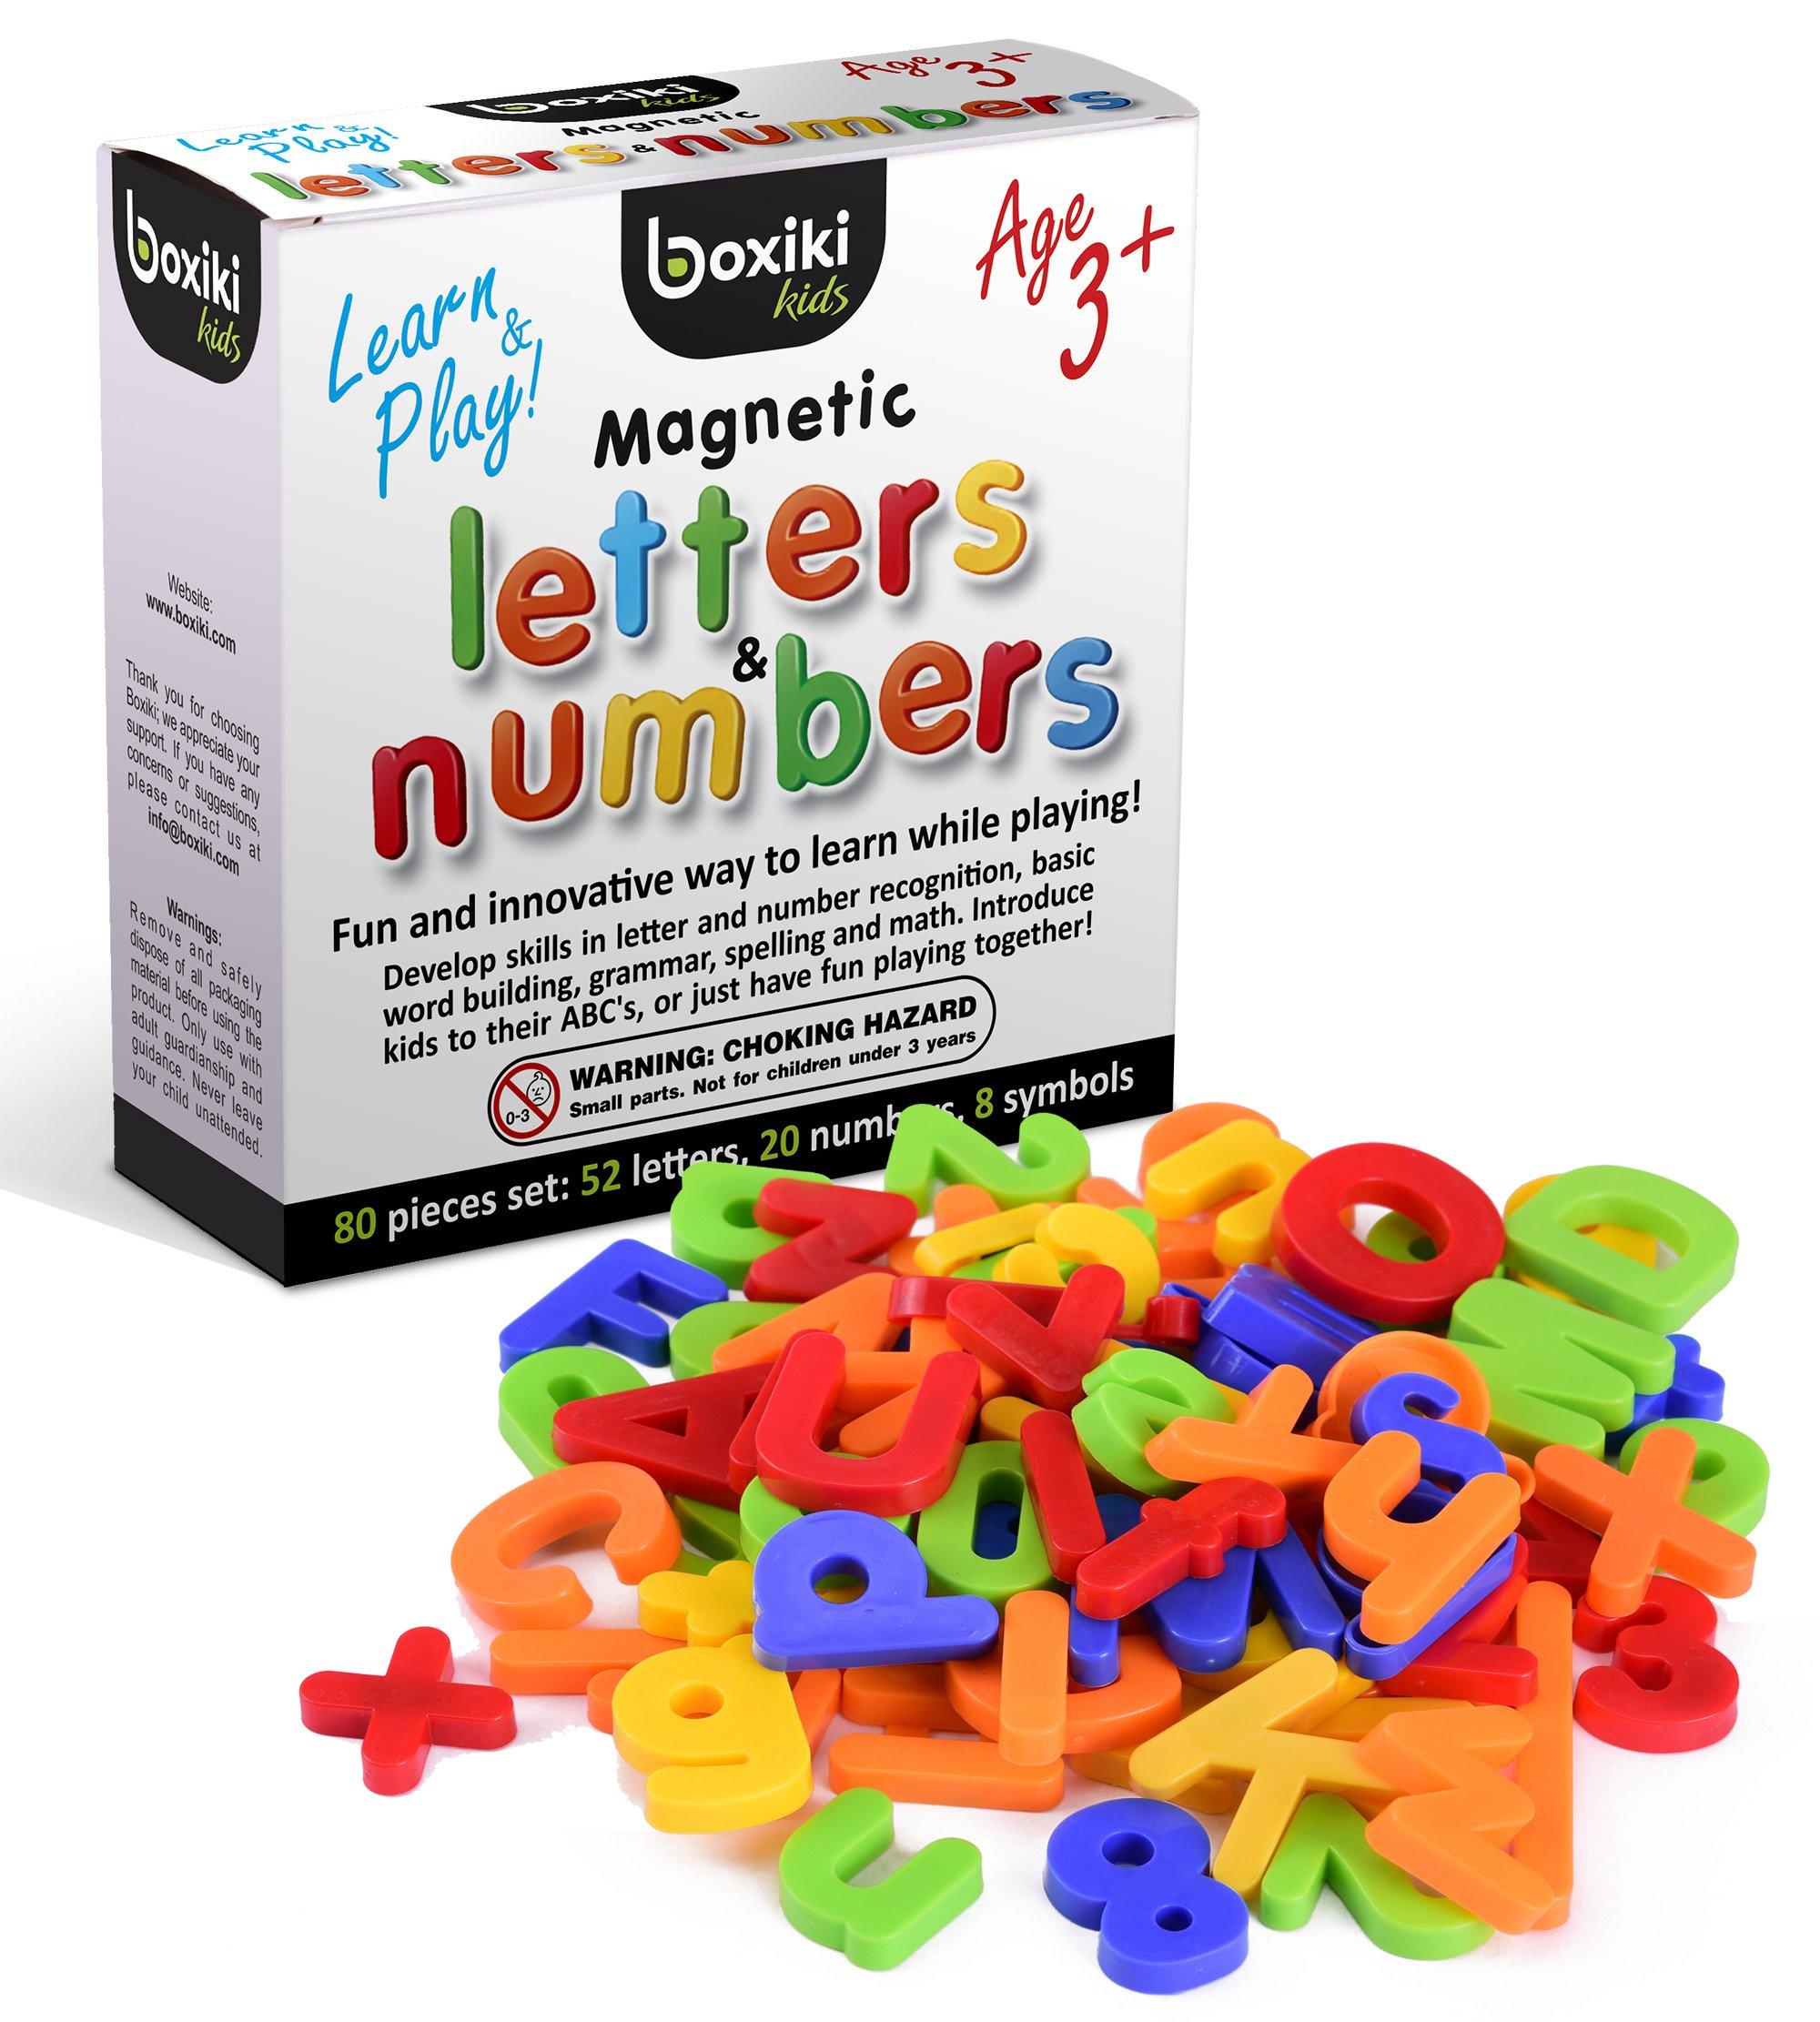 Boxiki kids 80 Piece Magnetic Alphabet Letters and Numbers Set for Kids By Magnetic Letters Numbers and Math Symbols